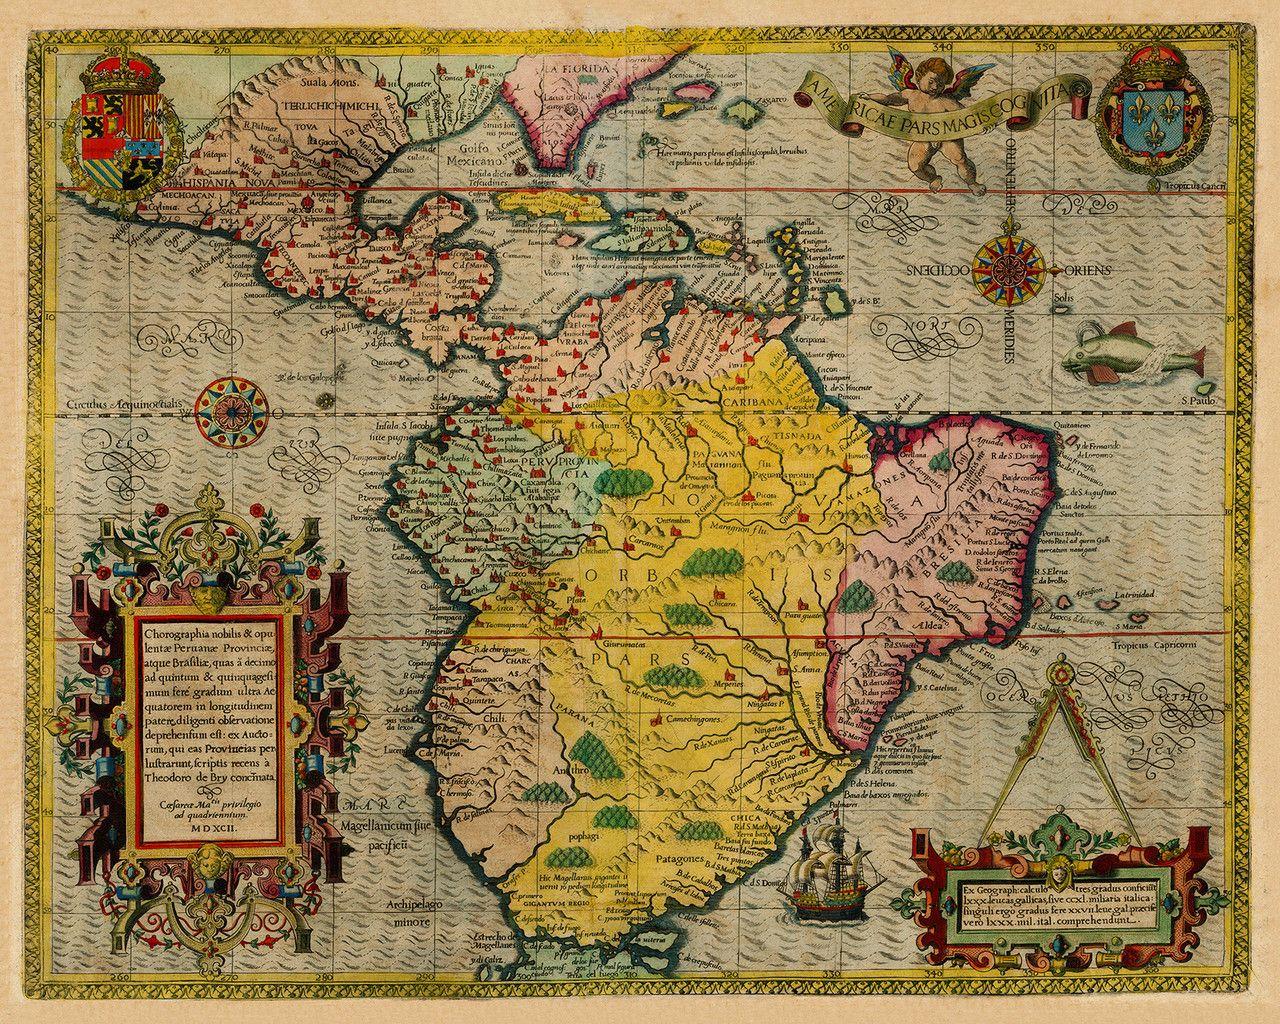 South America Caribbean De Bry Map Battlemapsus Maps - Antiques us maps with compass